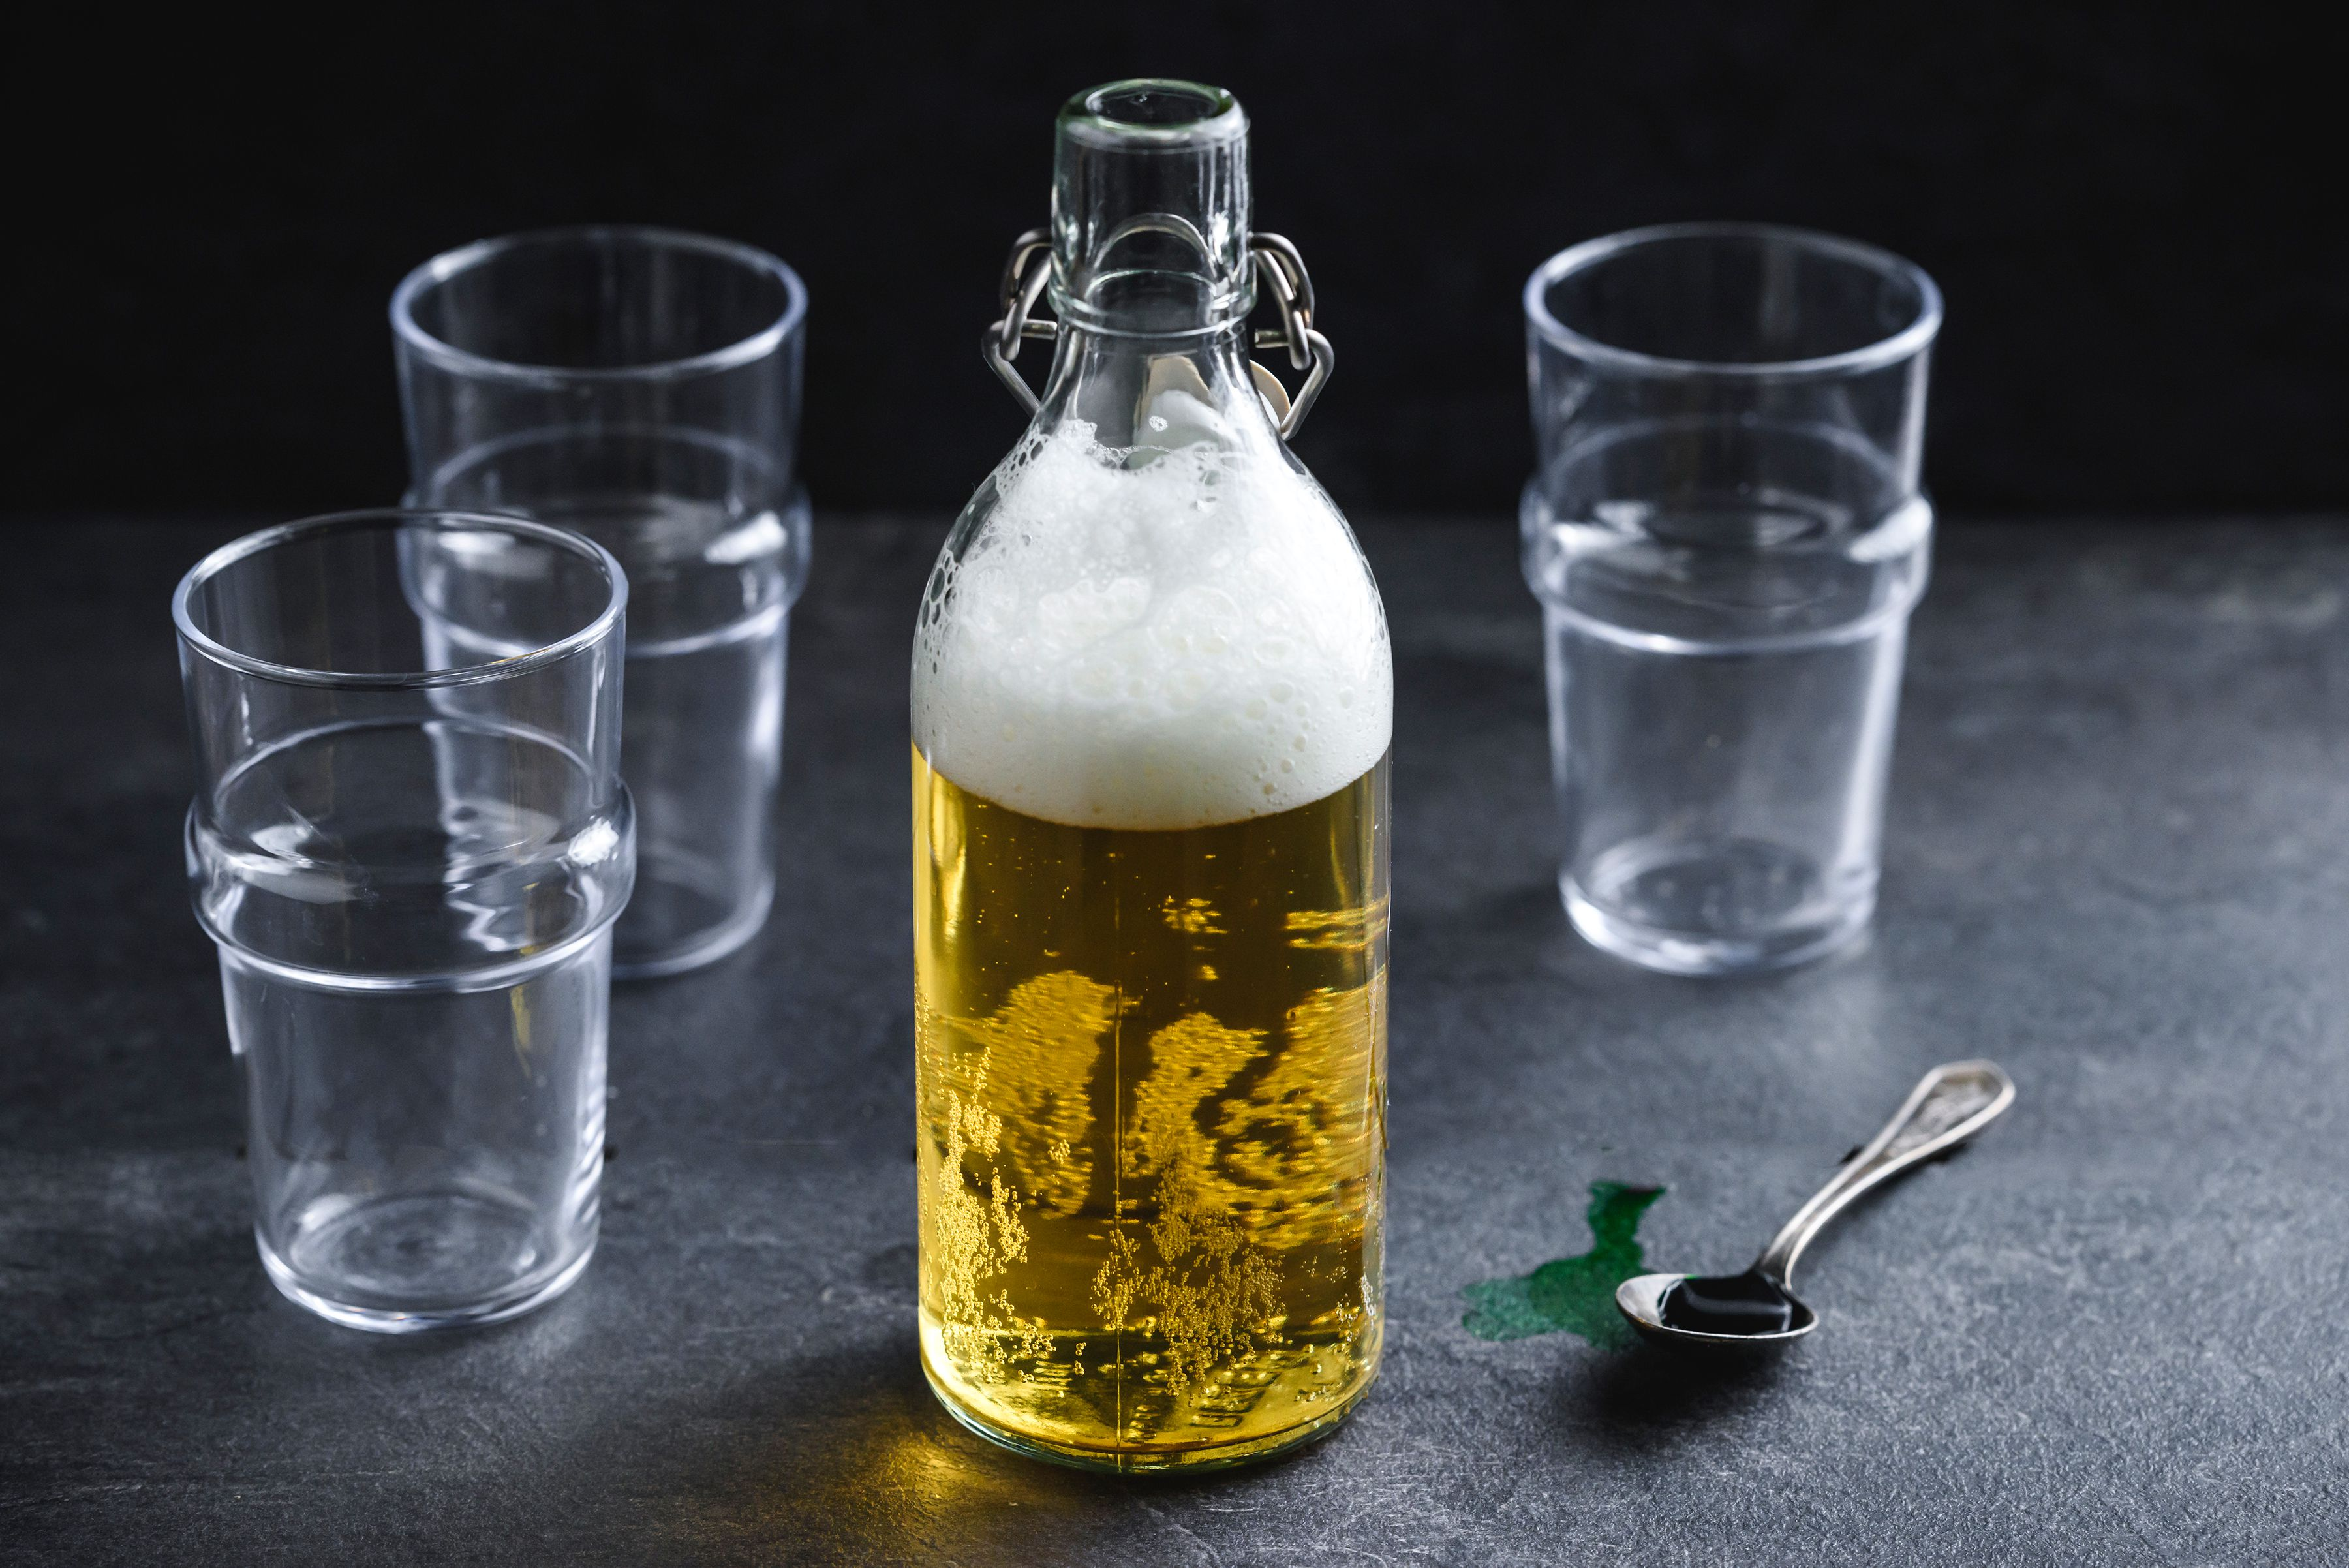 Ingredients for green beer